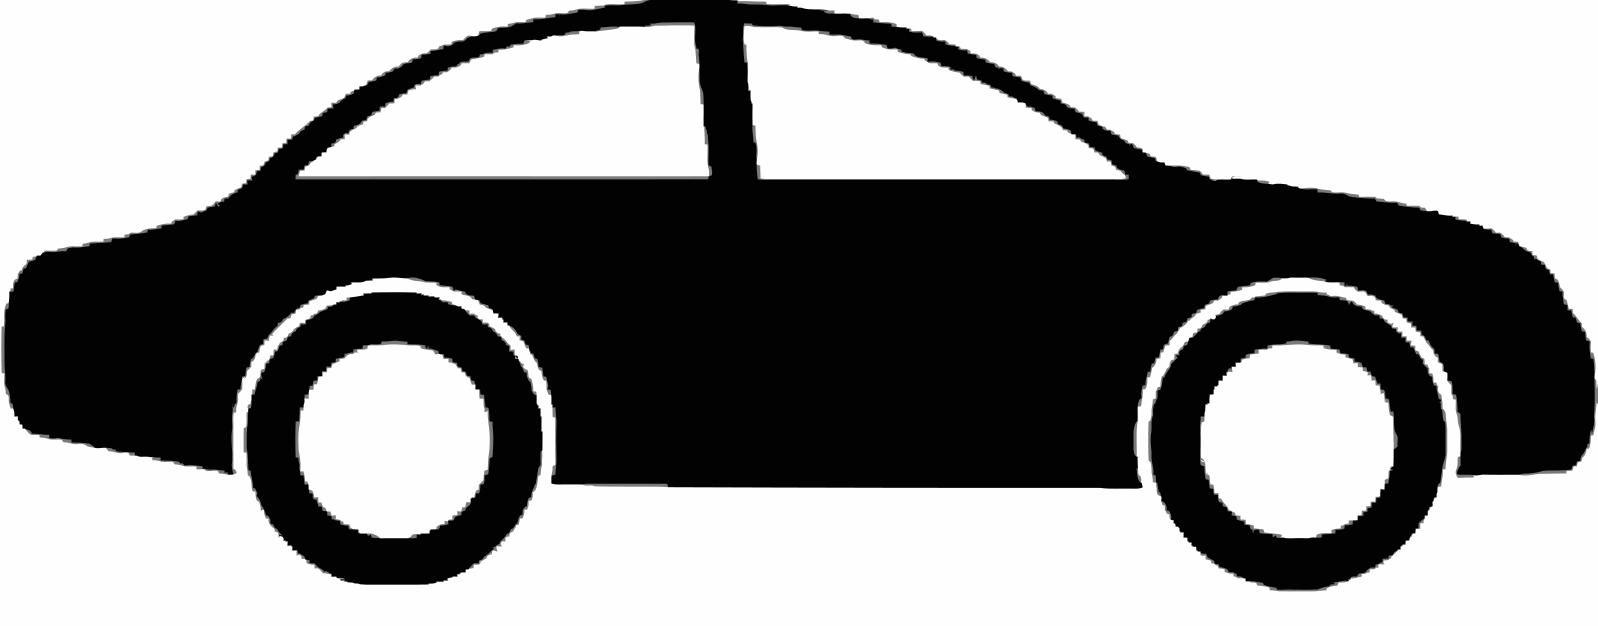 1598x626 Car Clipart Simple